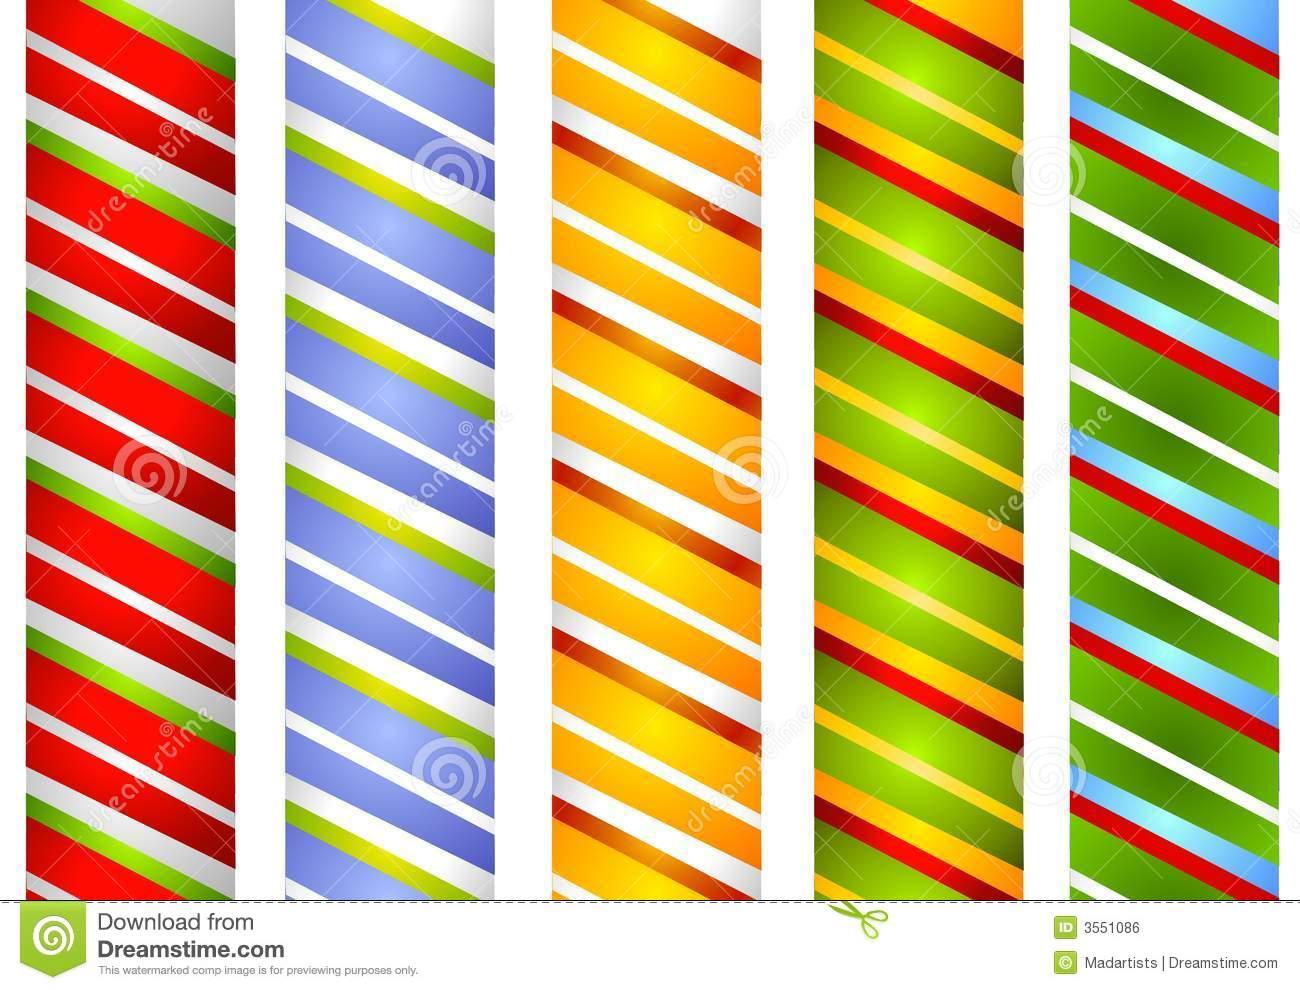 Clipart border of green stripe.